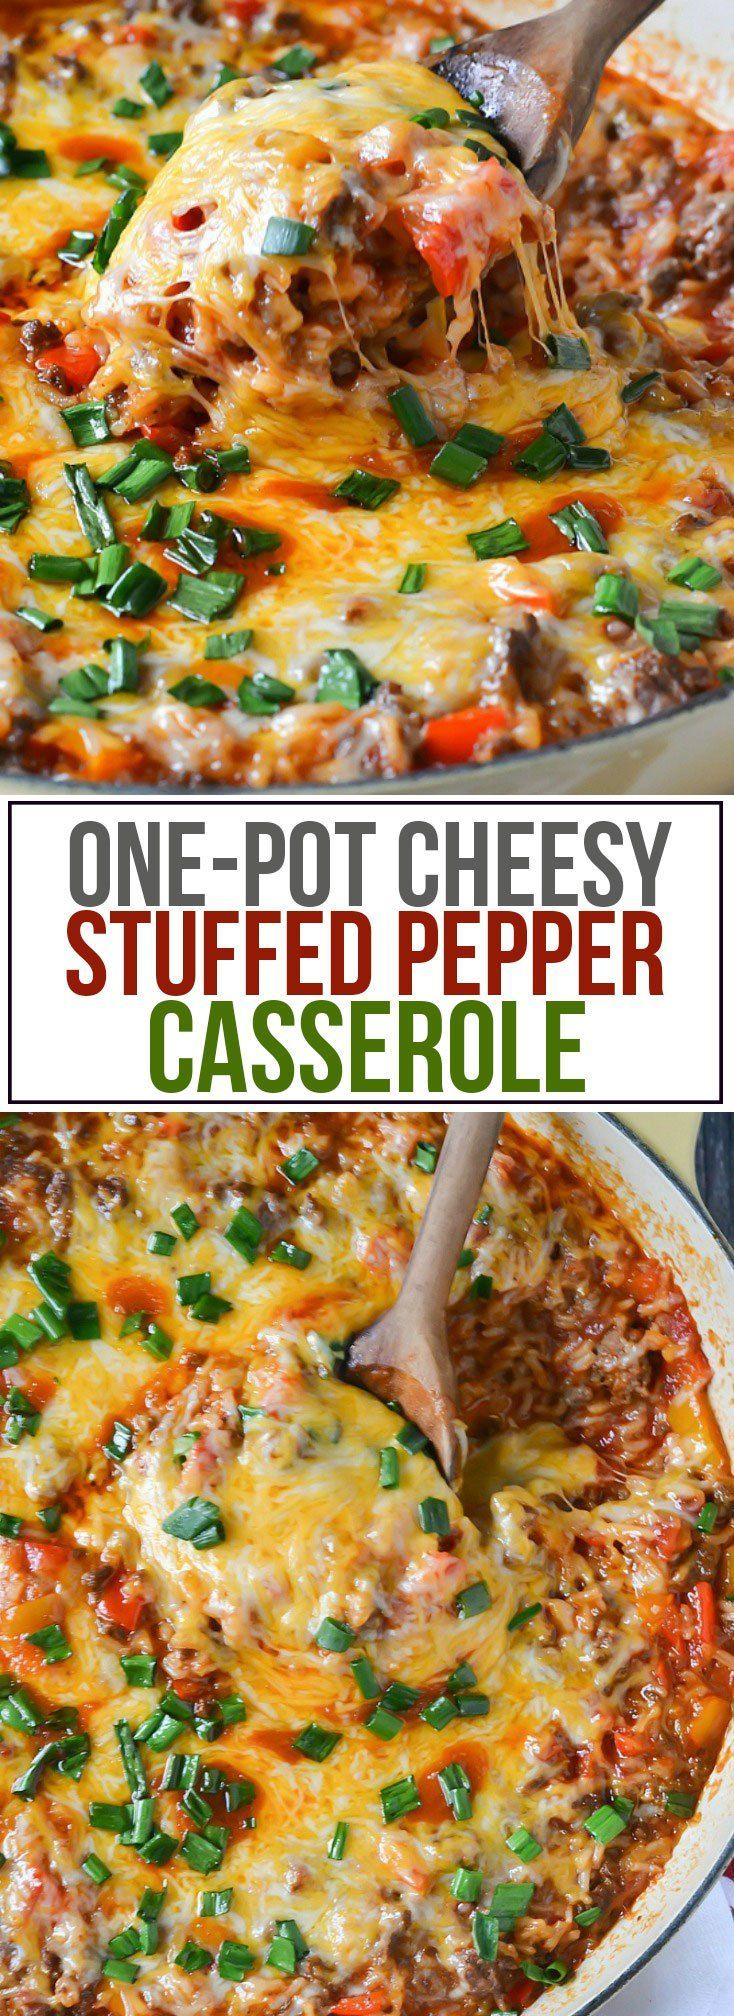 One-Pot Cheesy Stuffed Pepper Casserole images